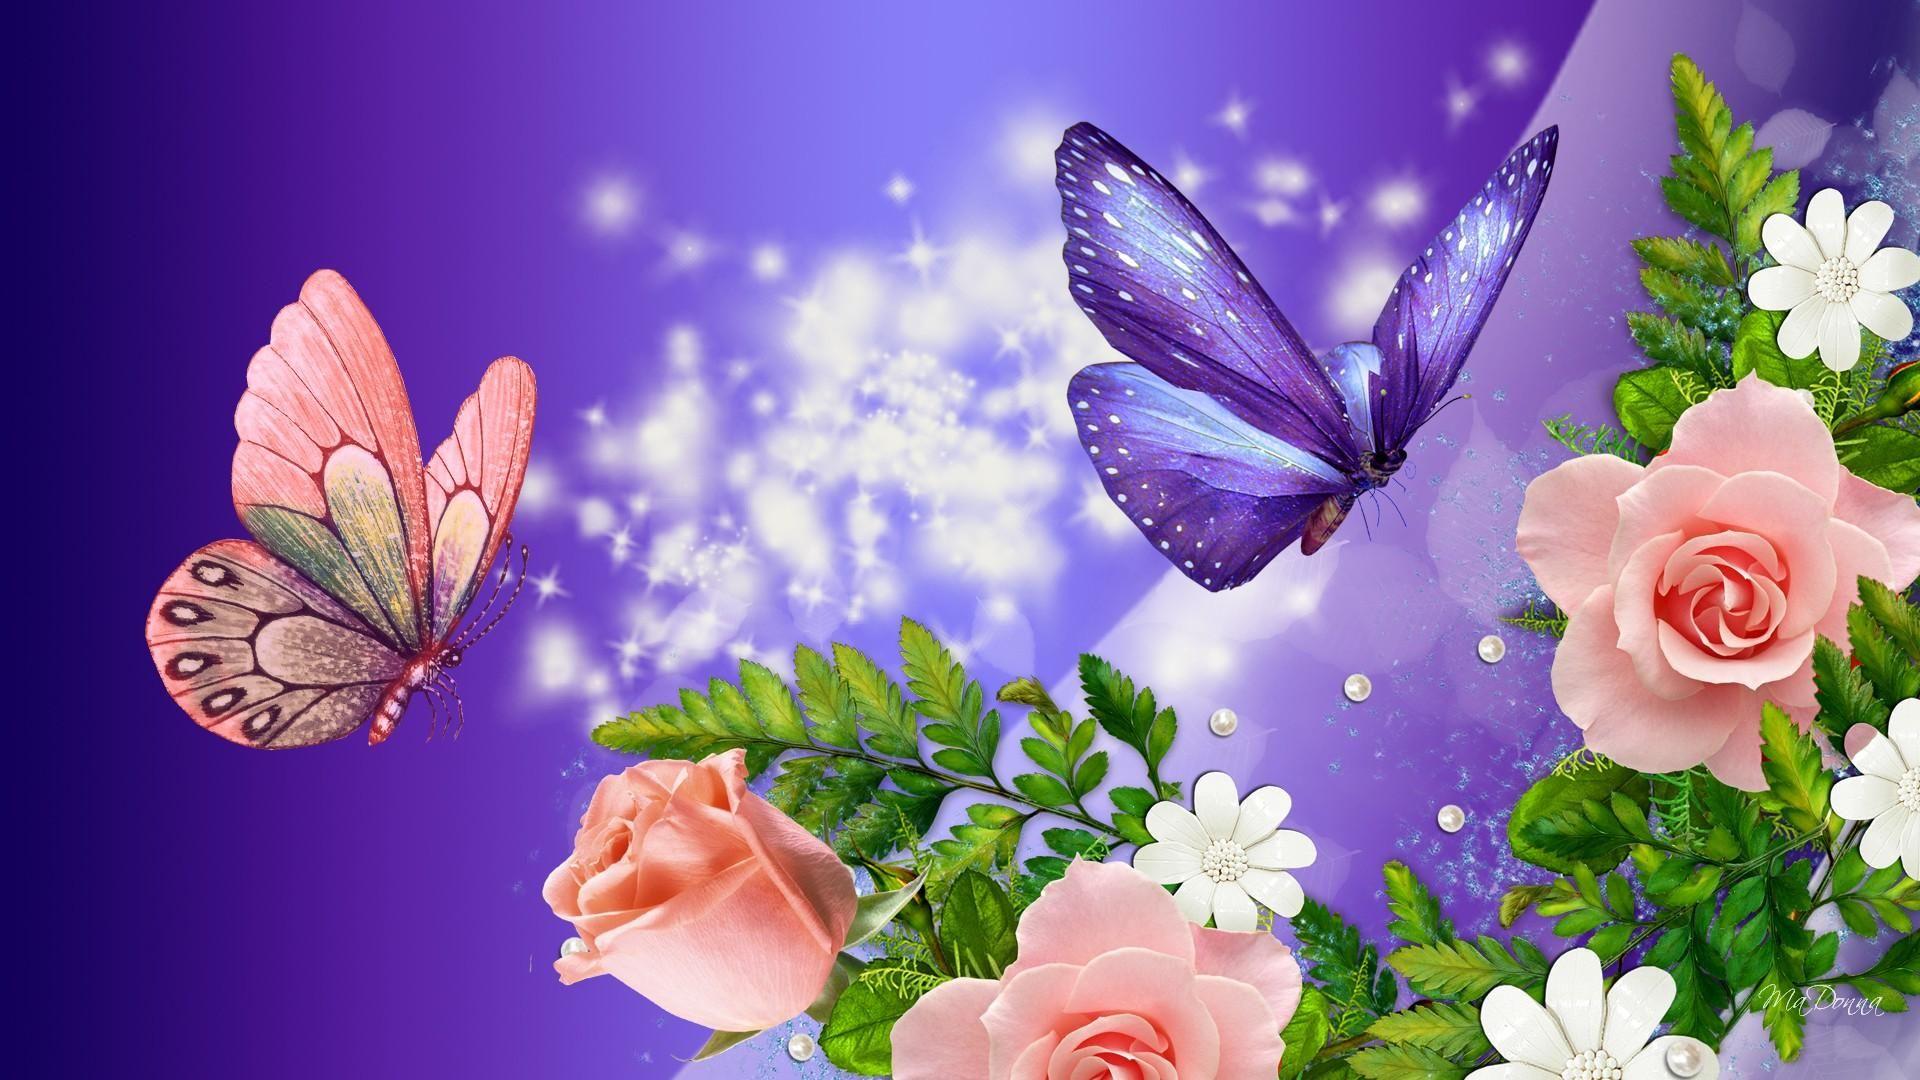 HD Peach Roses Purple Fantasy Wallpaper fd Pinterest